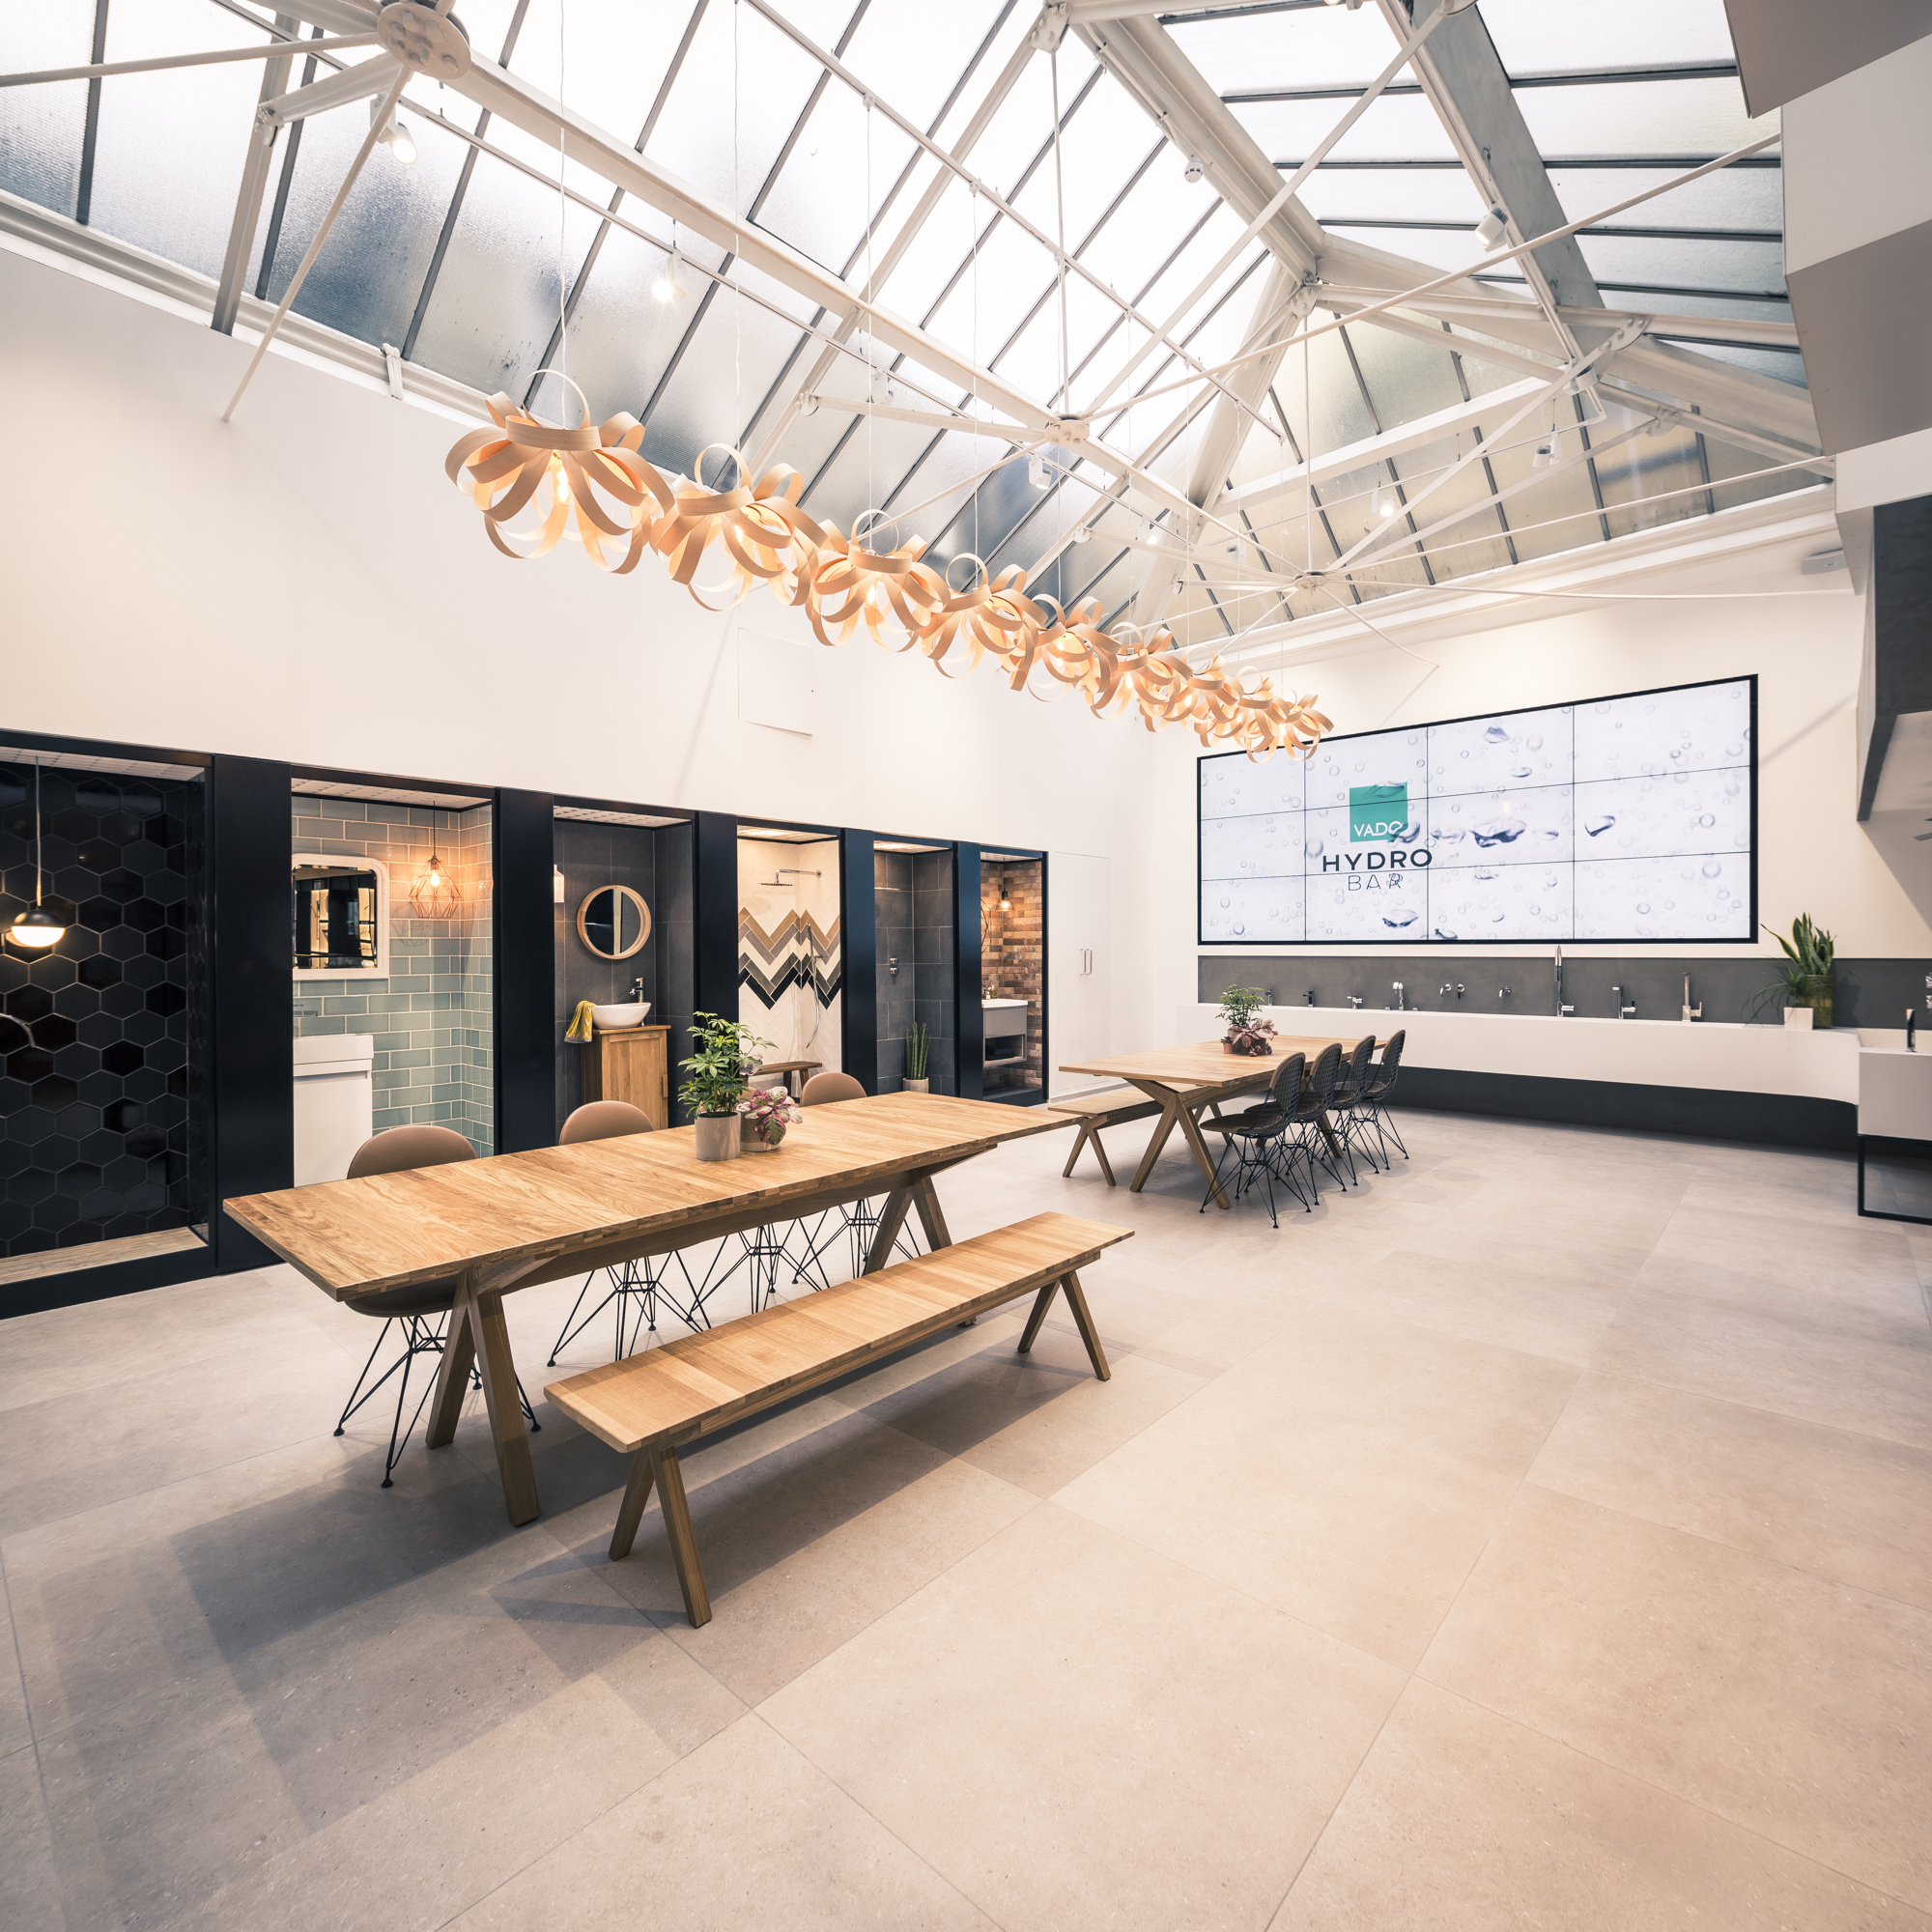 Mat Lab Refurb Wide Interiors Instagram-04.jpg